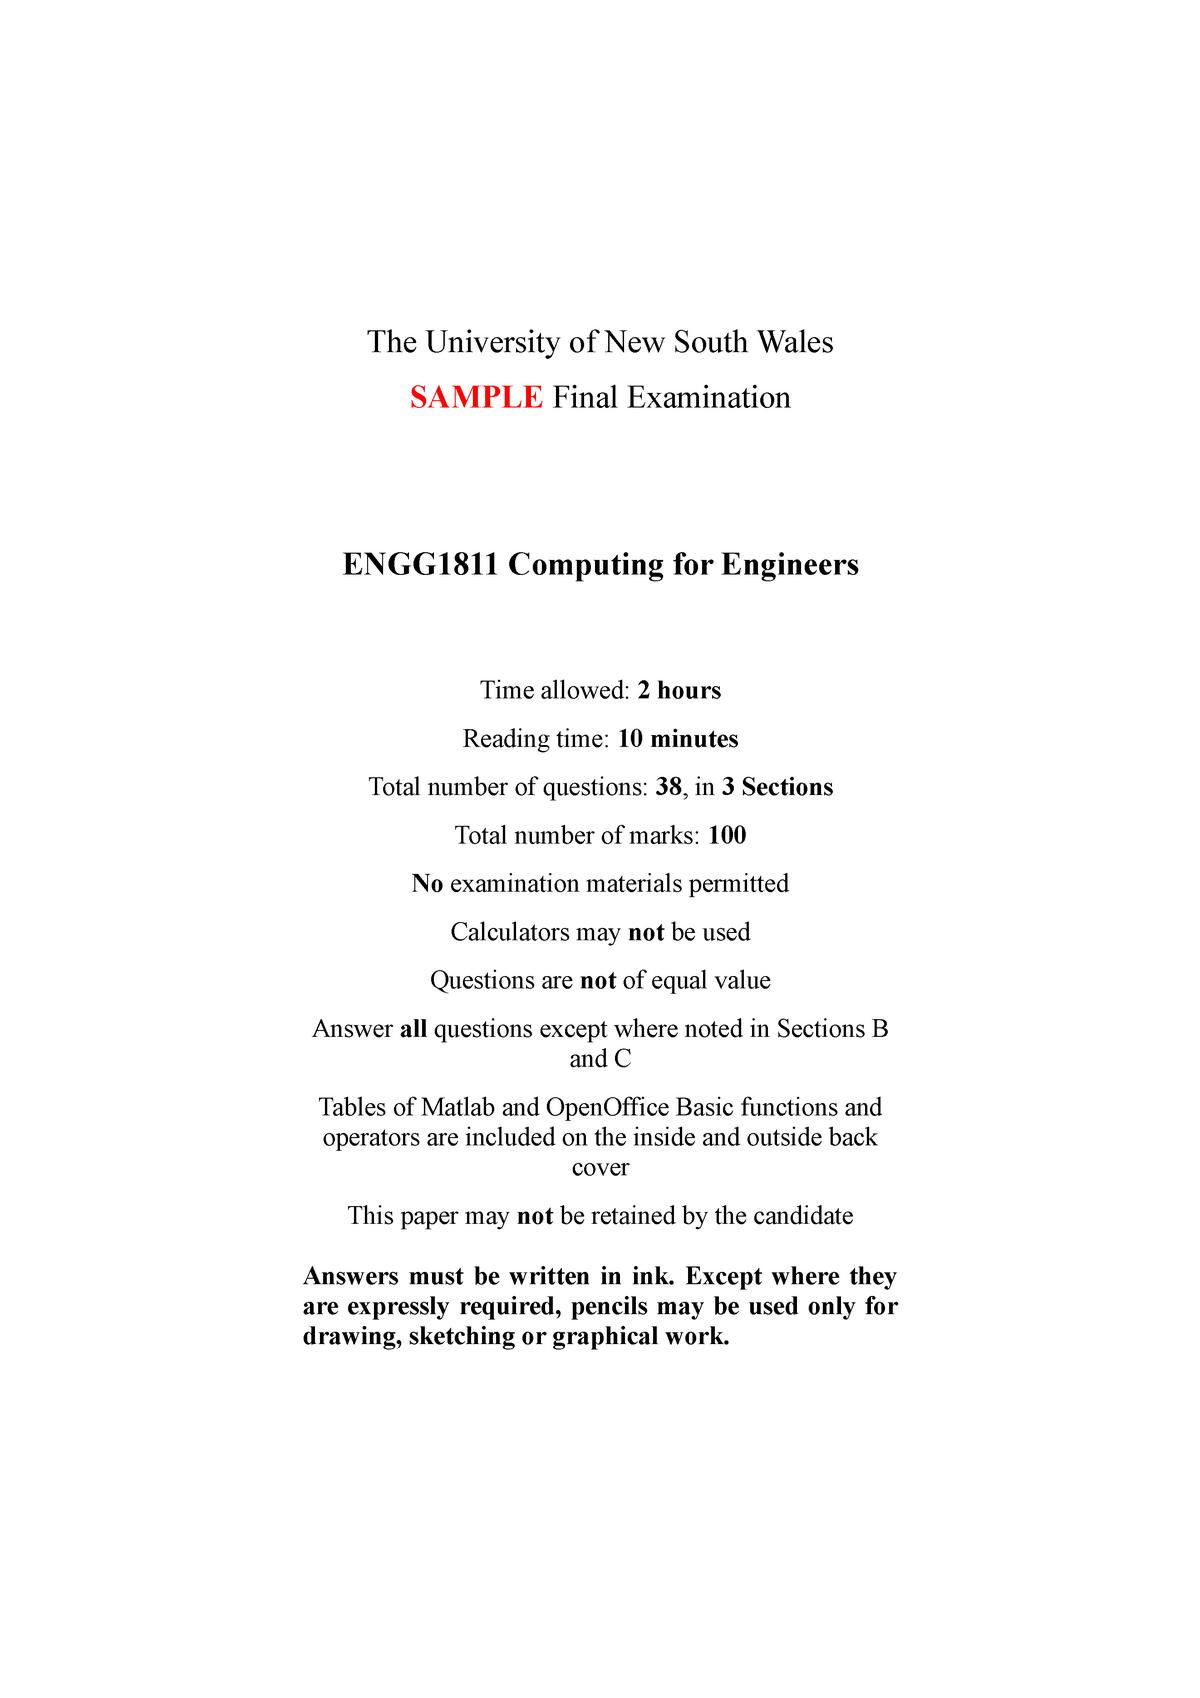 Sample/practice exam 2015, questions - ENGG1811 - UNSW - StuDocu